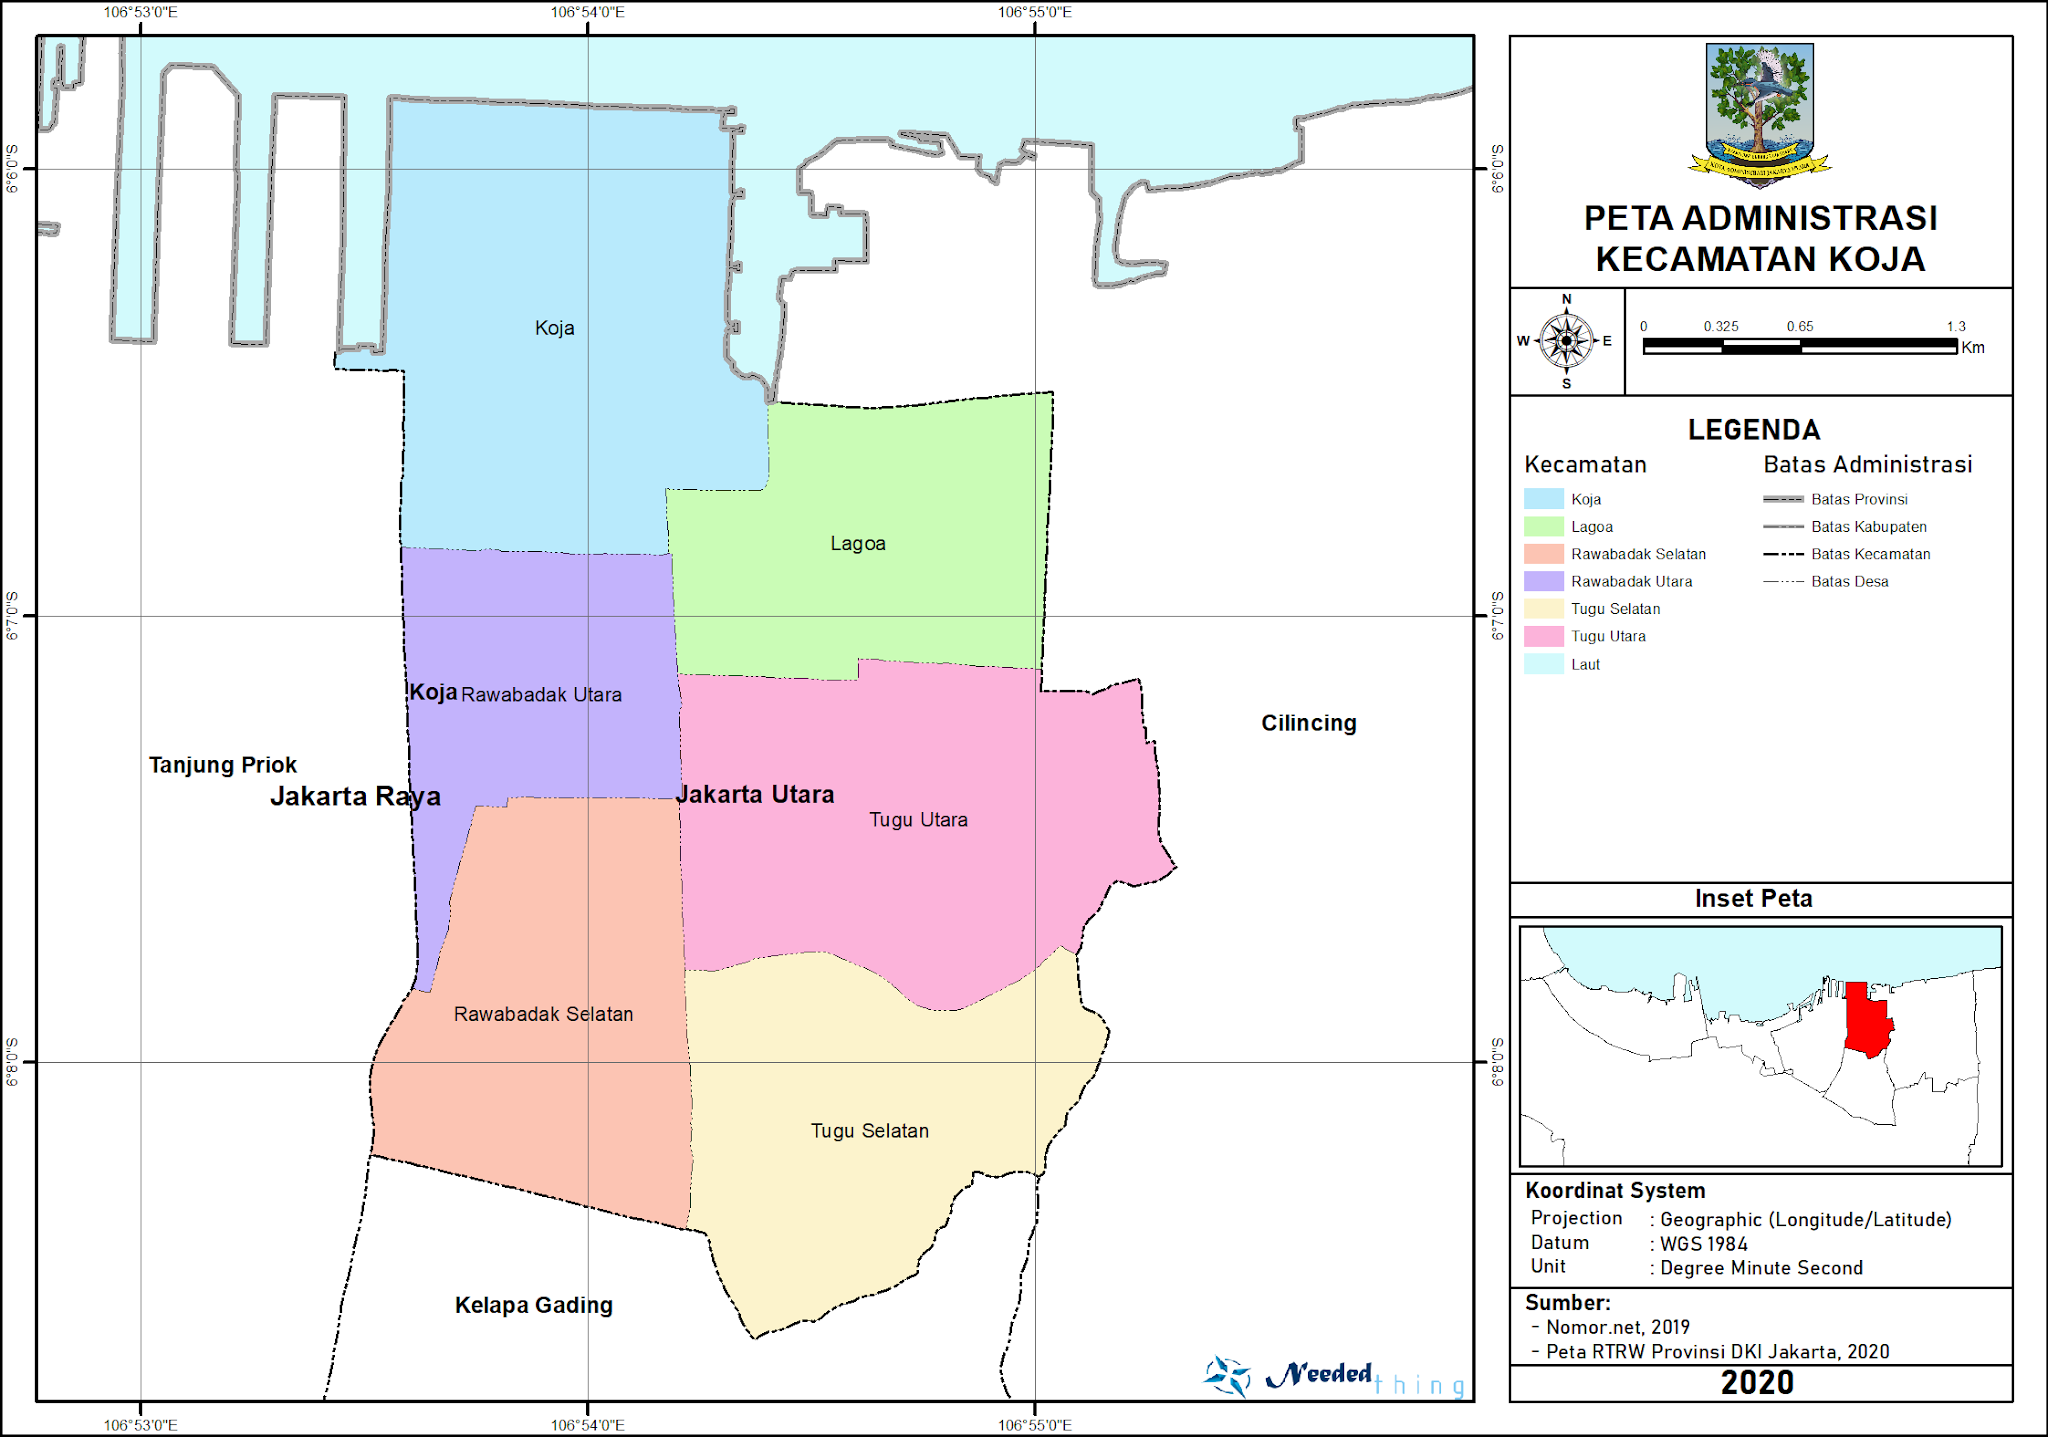 Peta Administrasi Kecamatan Koja, Kota Jakarta Utara ...